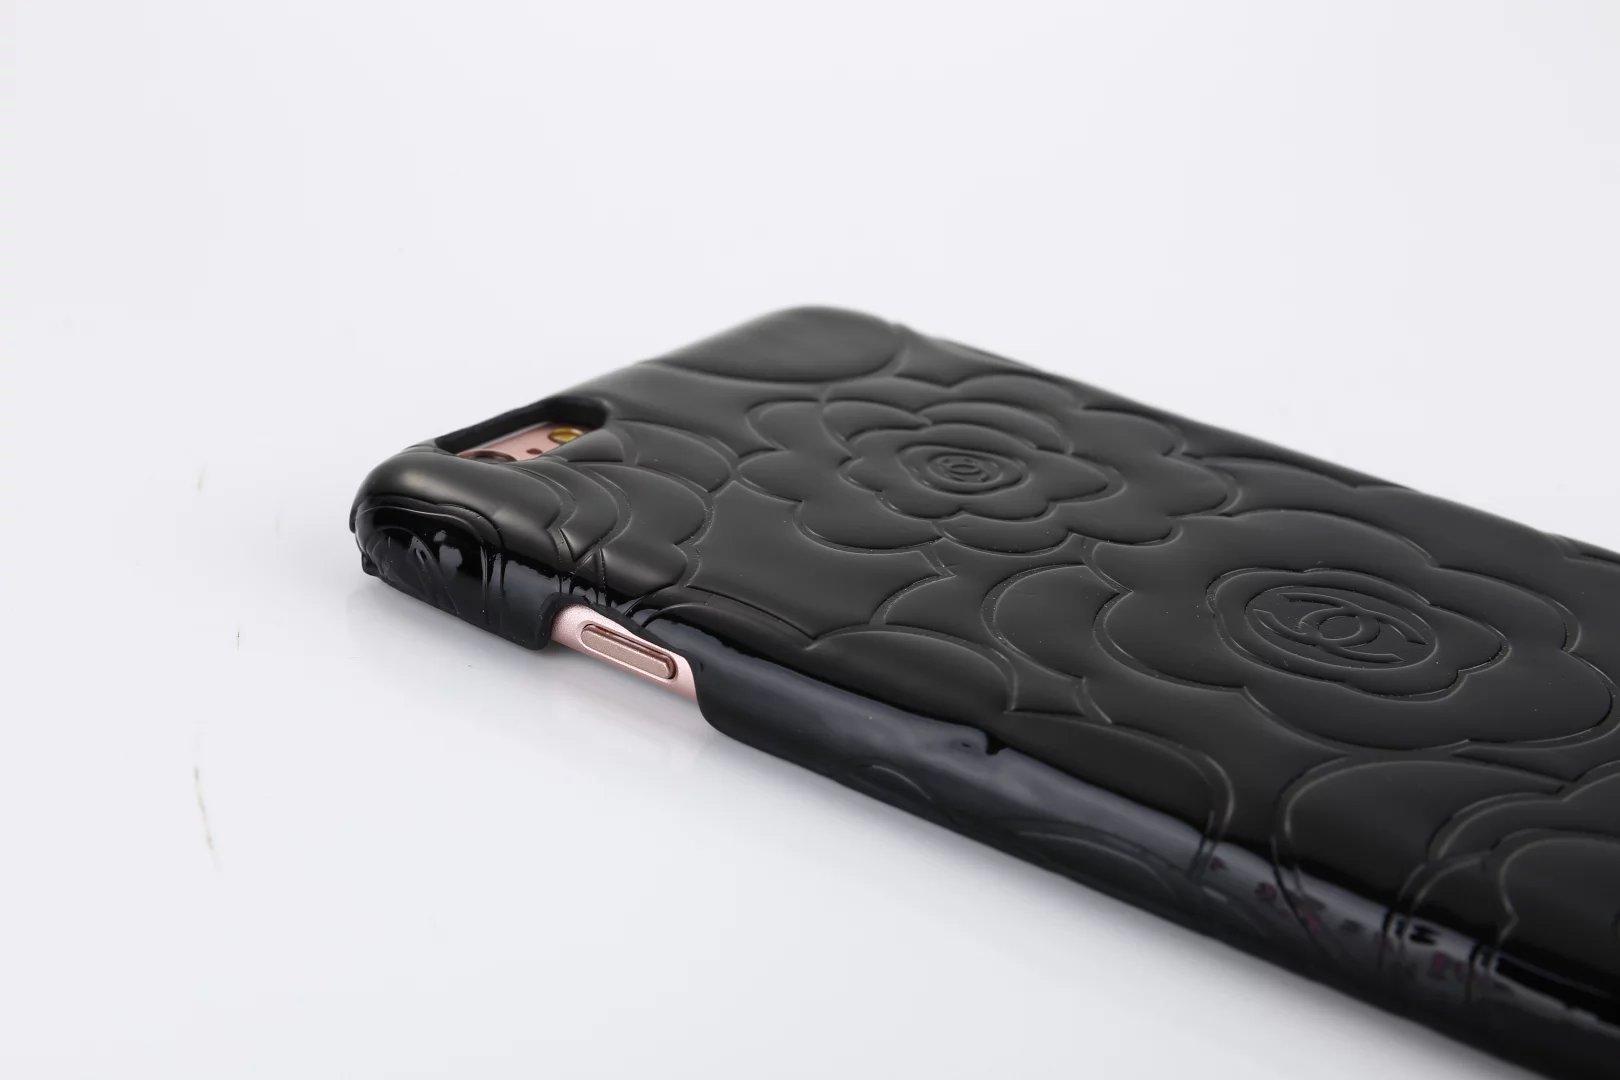 schutzhülle für iphone handyhülle foto iphone Chanel iphone7 Plus hülle handyhülle s7 7lbst gestalten iphone 7 Plus hardca7 elber gestalten geldbör7 iphone 7 Plus handy ca7 iphone 7 Plus iphone 7 Plus silikonhülle eifon 7